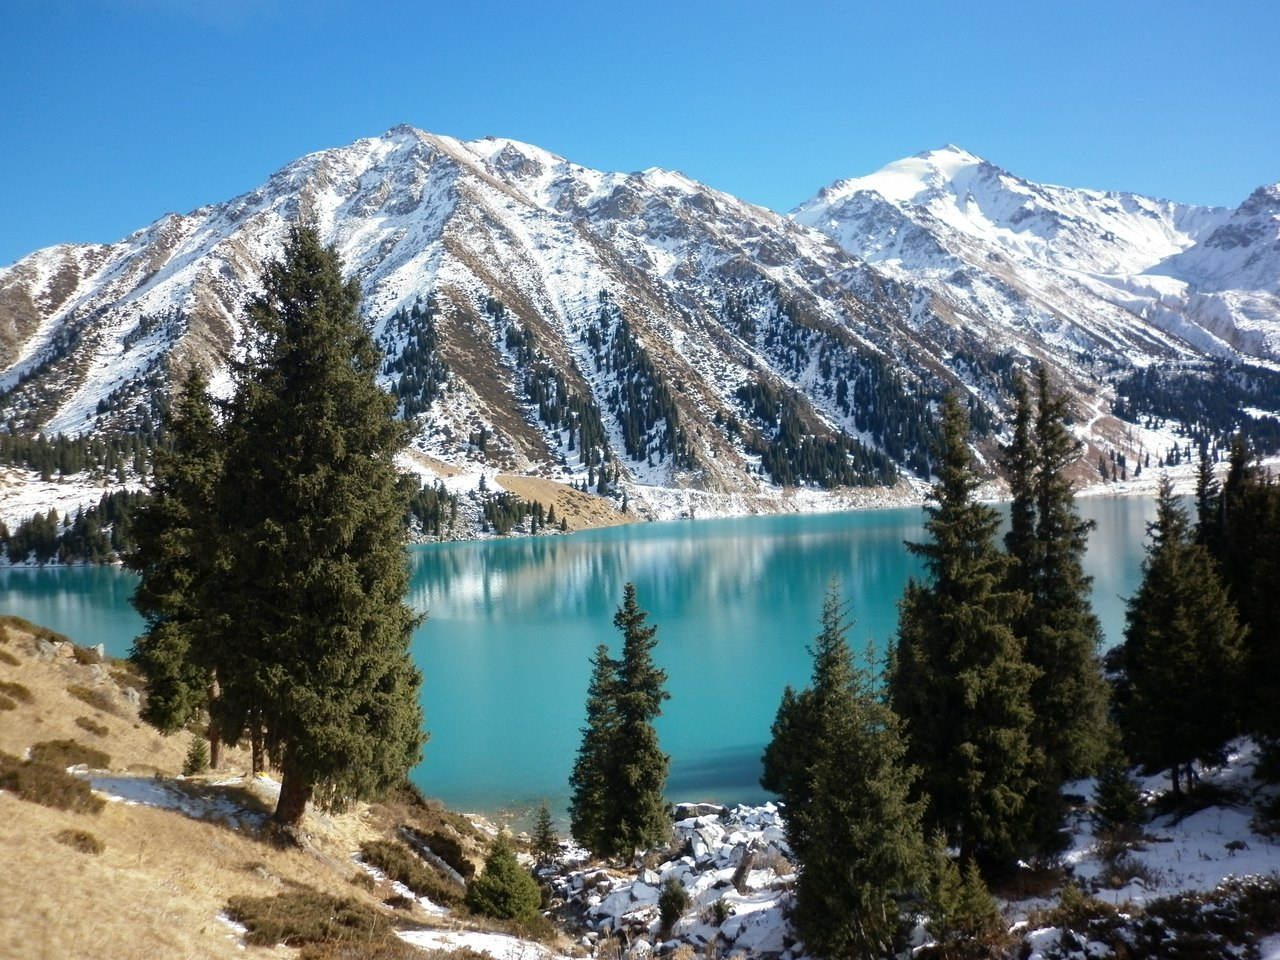 Природа казахстана картинки с надписями